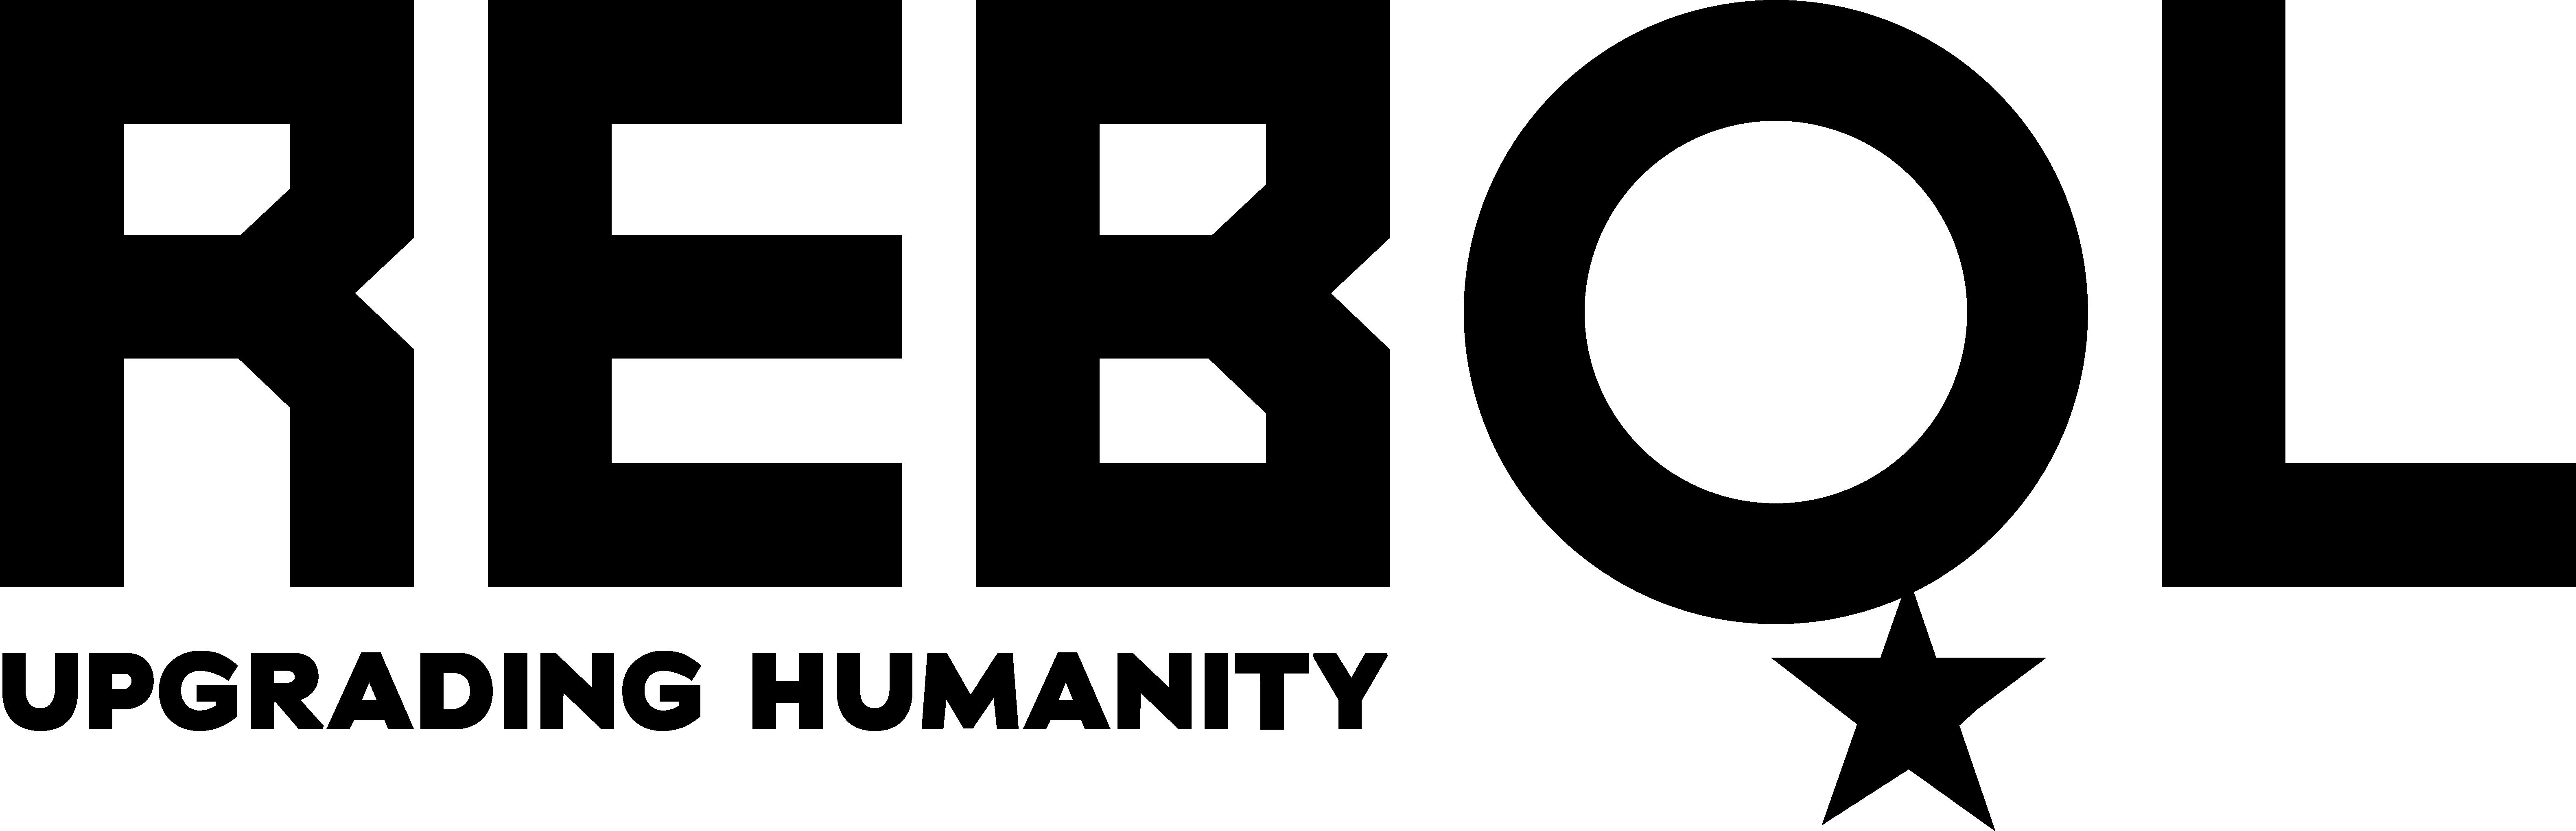 REBoL Logo